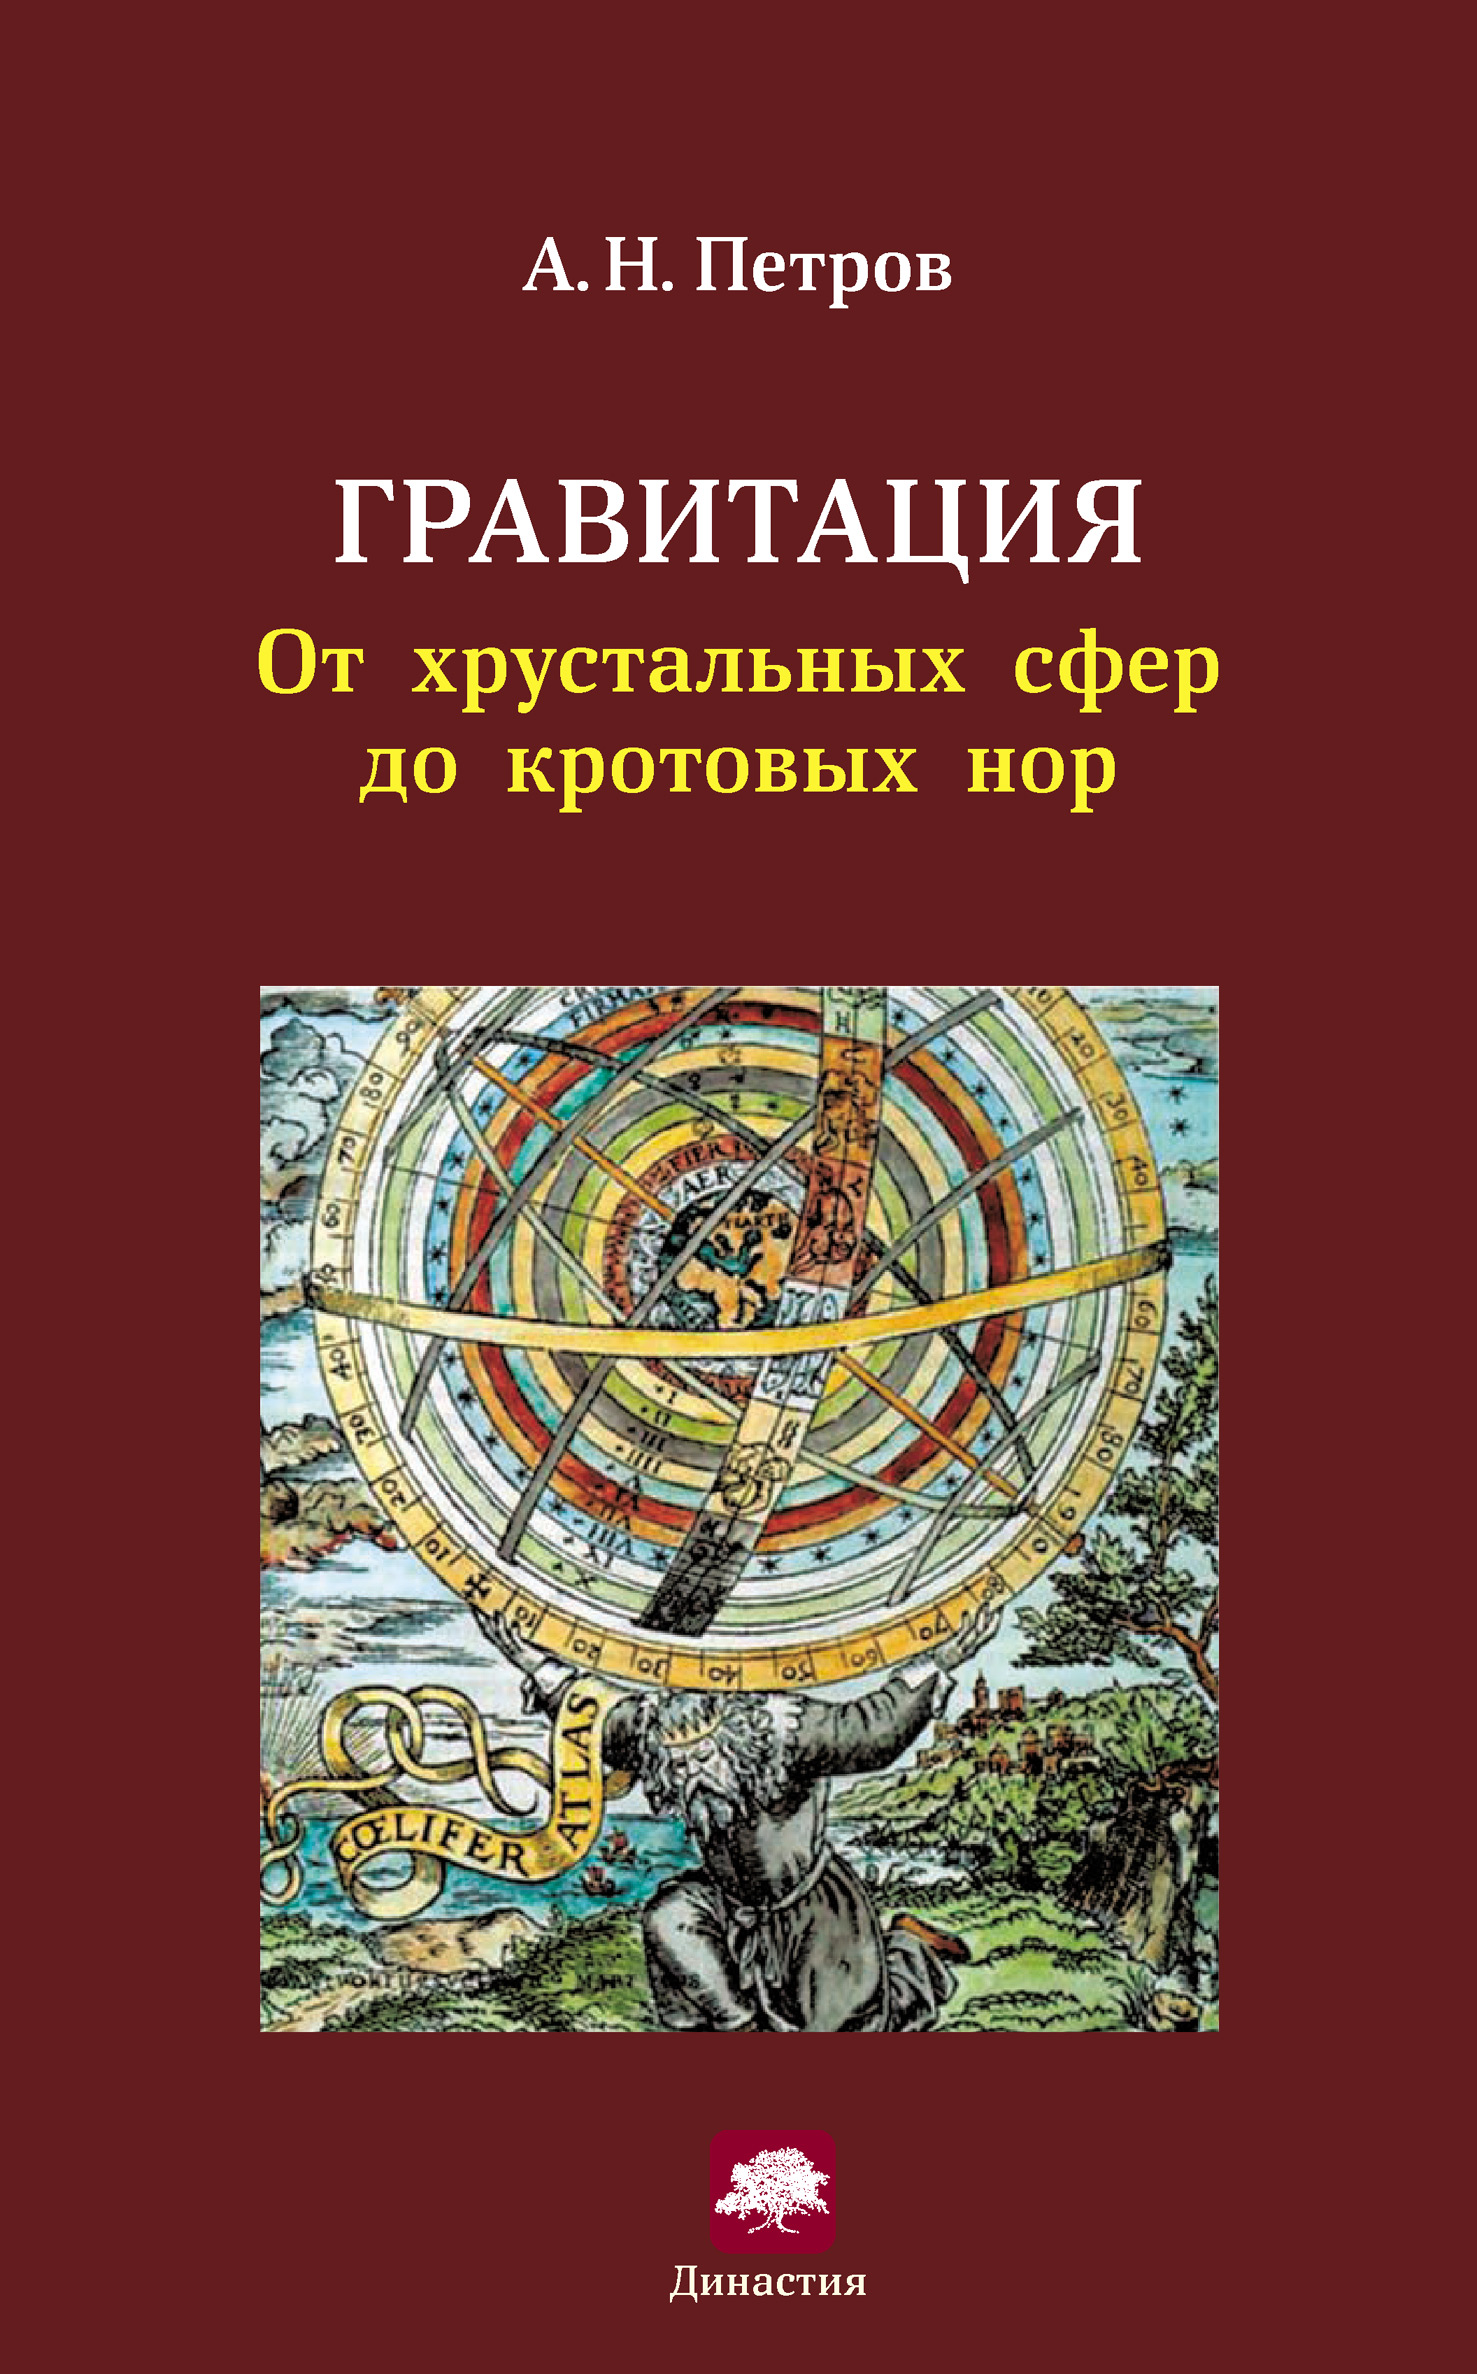 А. Н. Петров Гравитация. От хрустальных сфер до кротовых нор